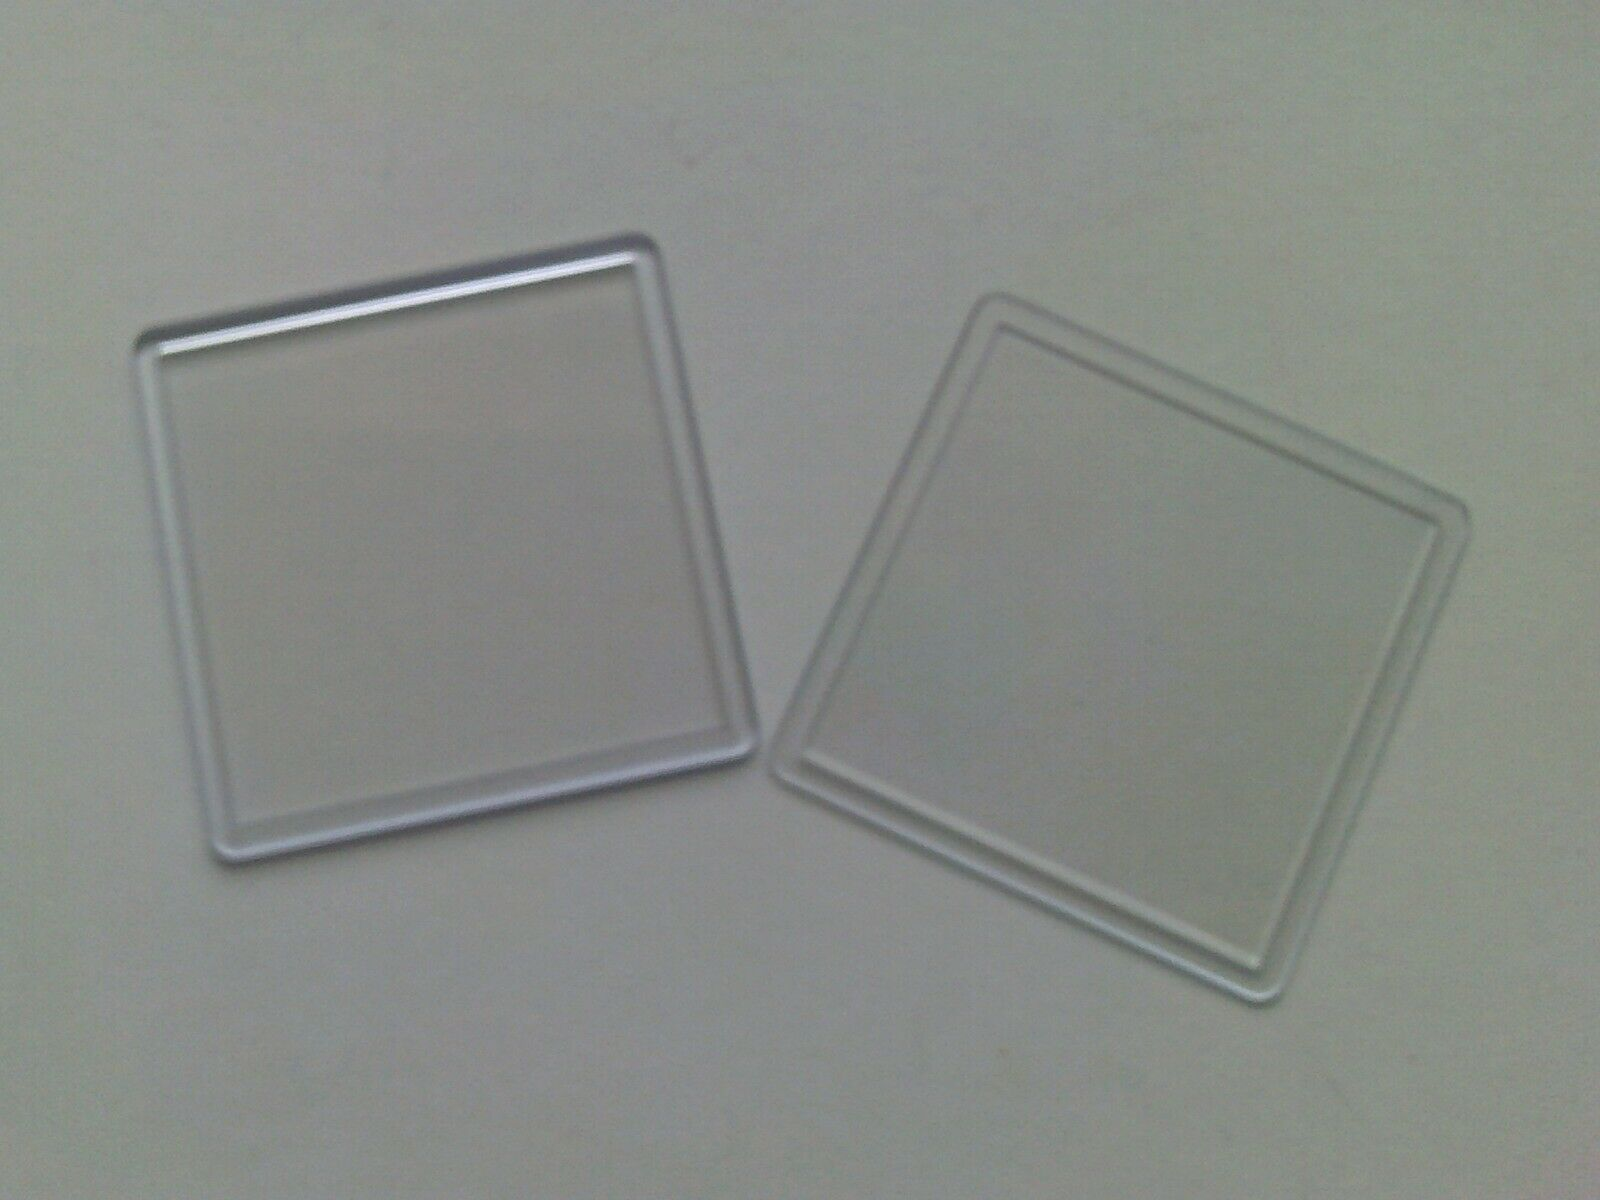 90mm x Insert N1 10 Blank Acrylic Clear Plastic Drinks Coasters